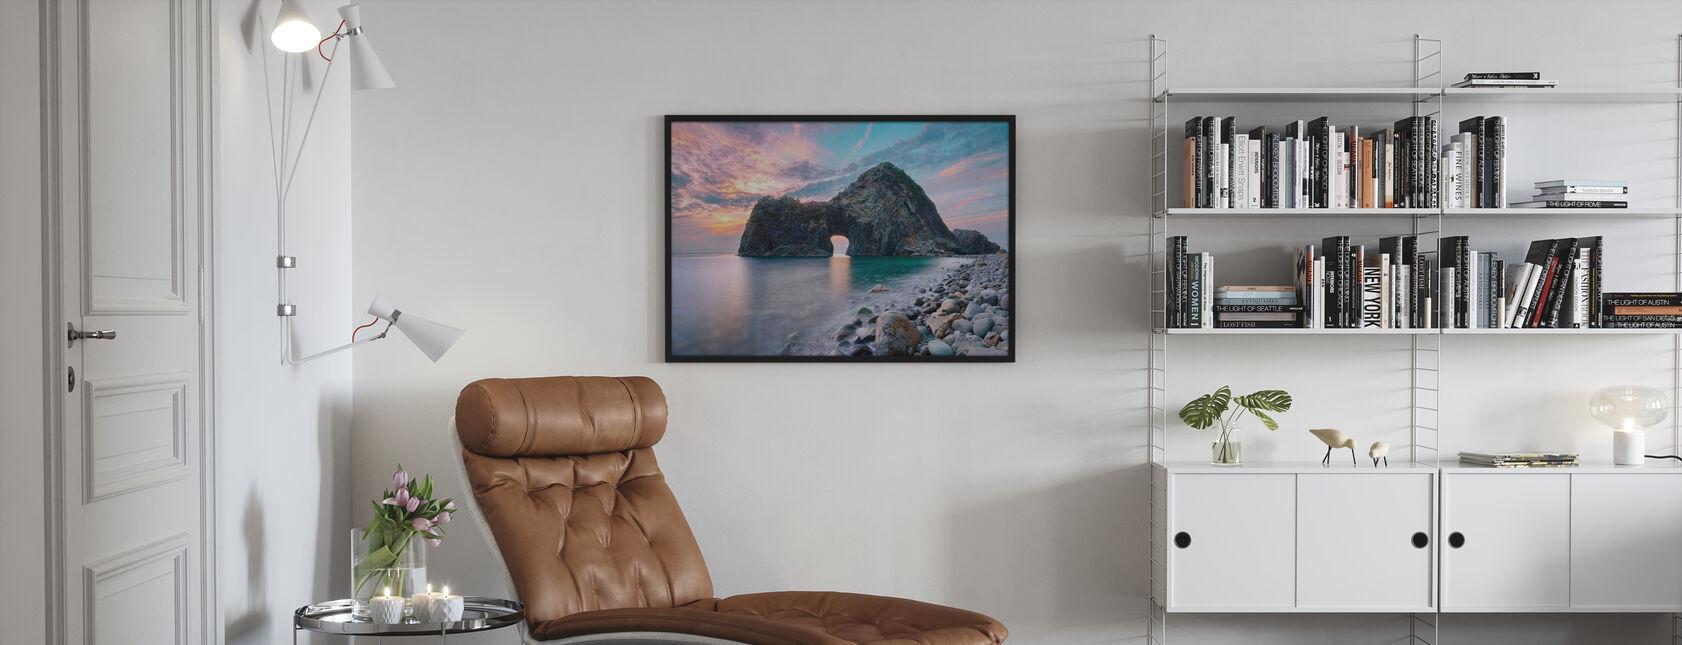 Rock Gate Senganmon - Plakat - Stue